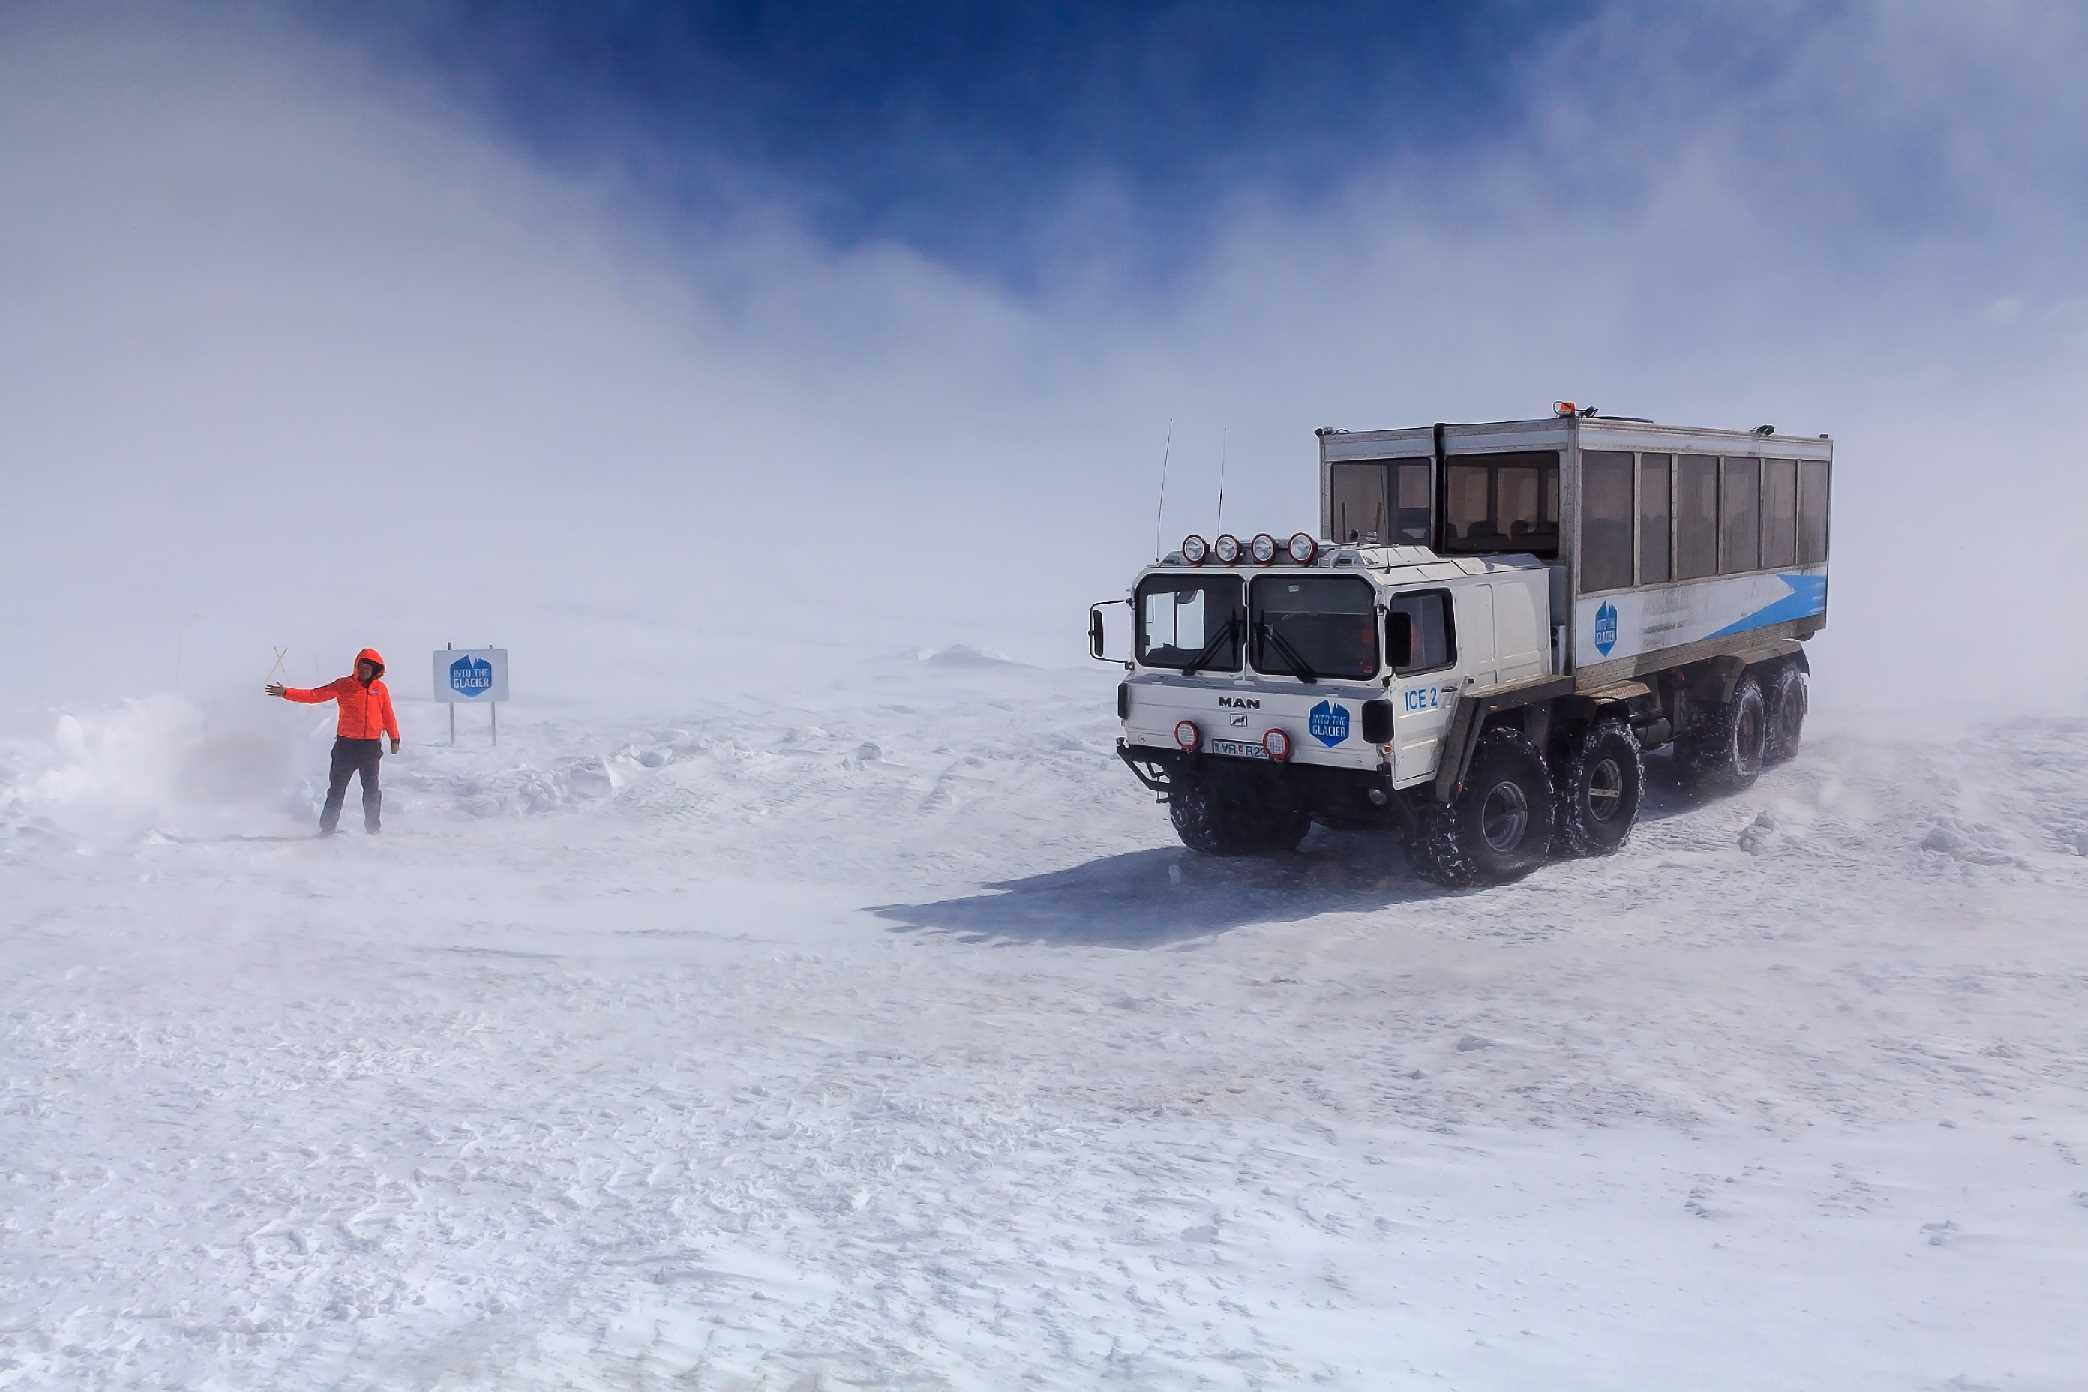 Ice icelandic times Roman Gerasymenko